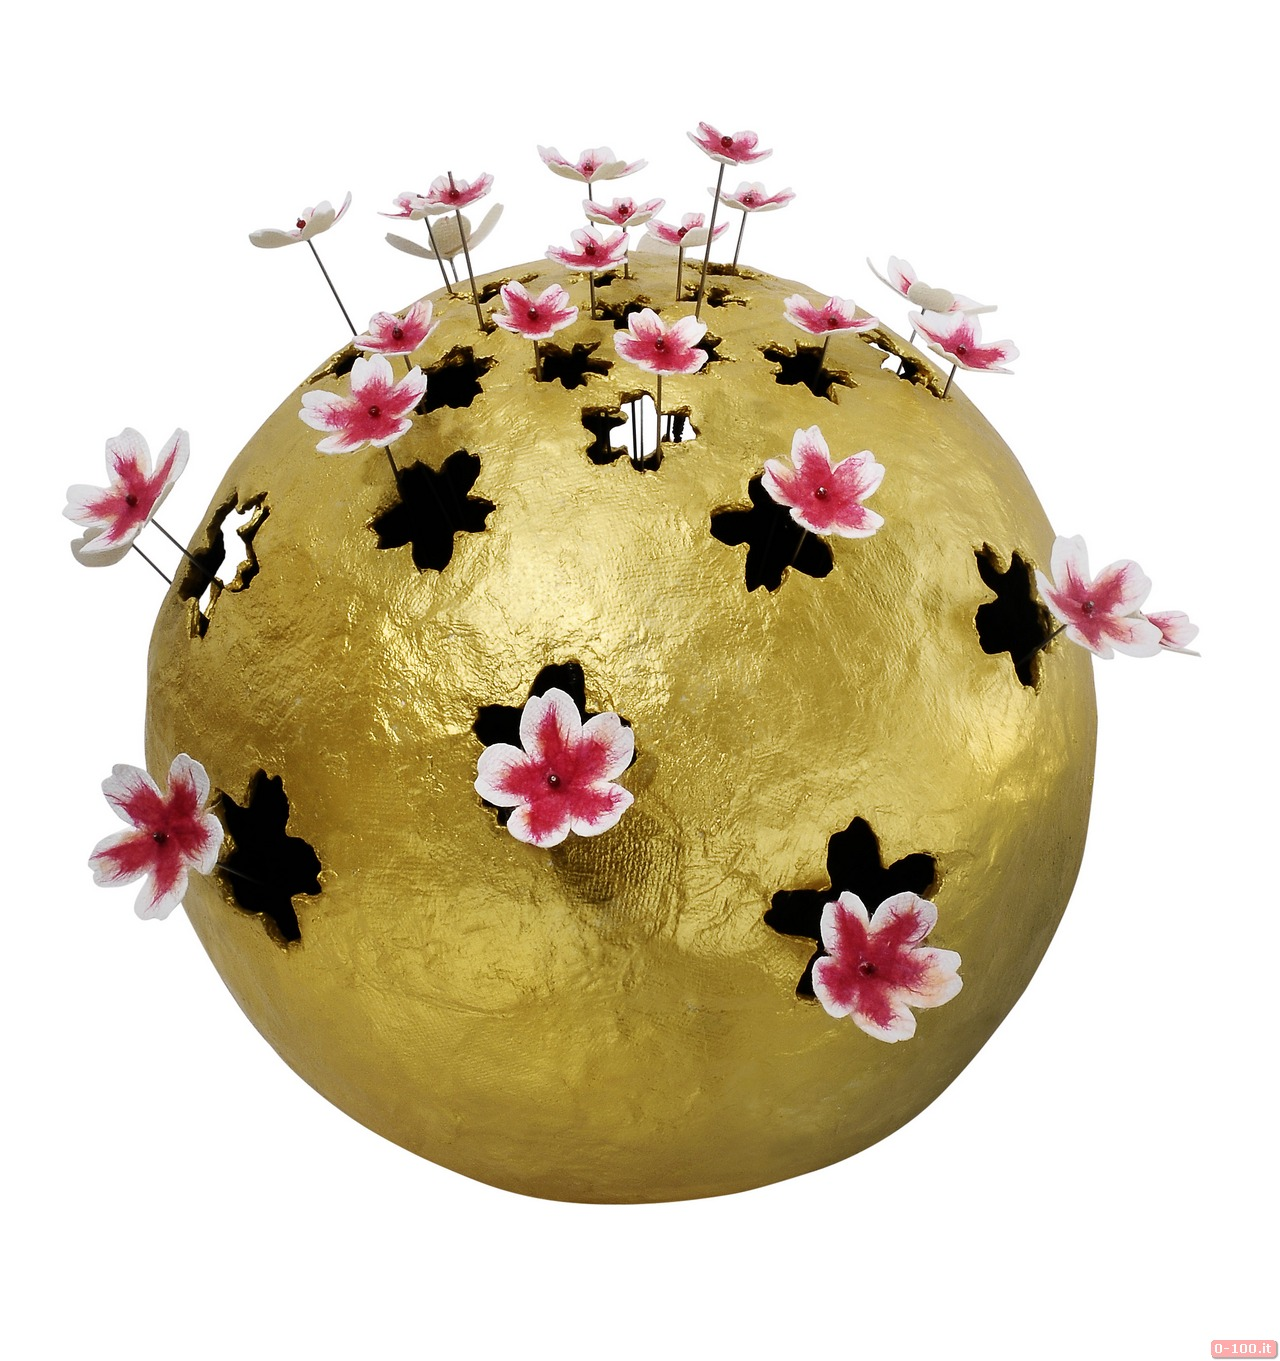 Blooming Creativity_Fragrance of Happiness - Ming Kiang Tan _Van Cleef & Arpels_0-100 1